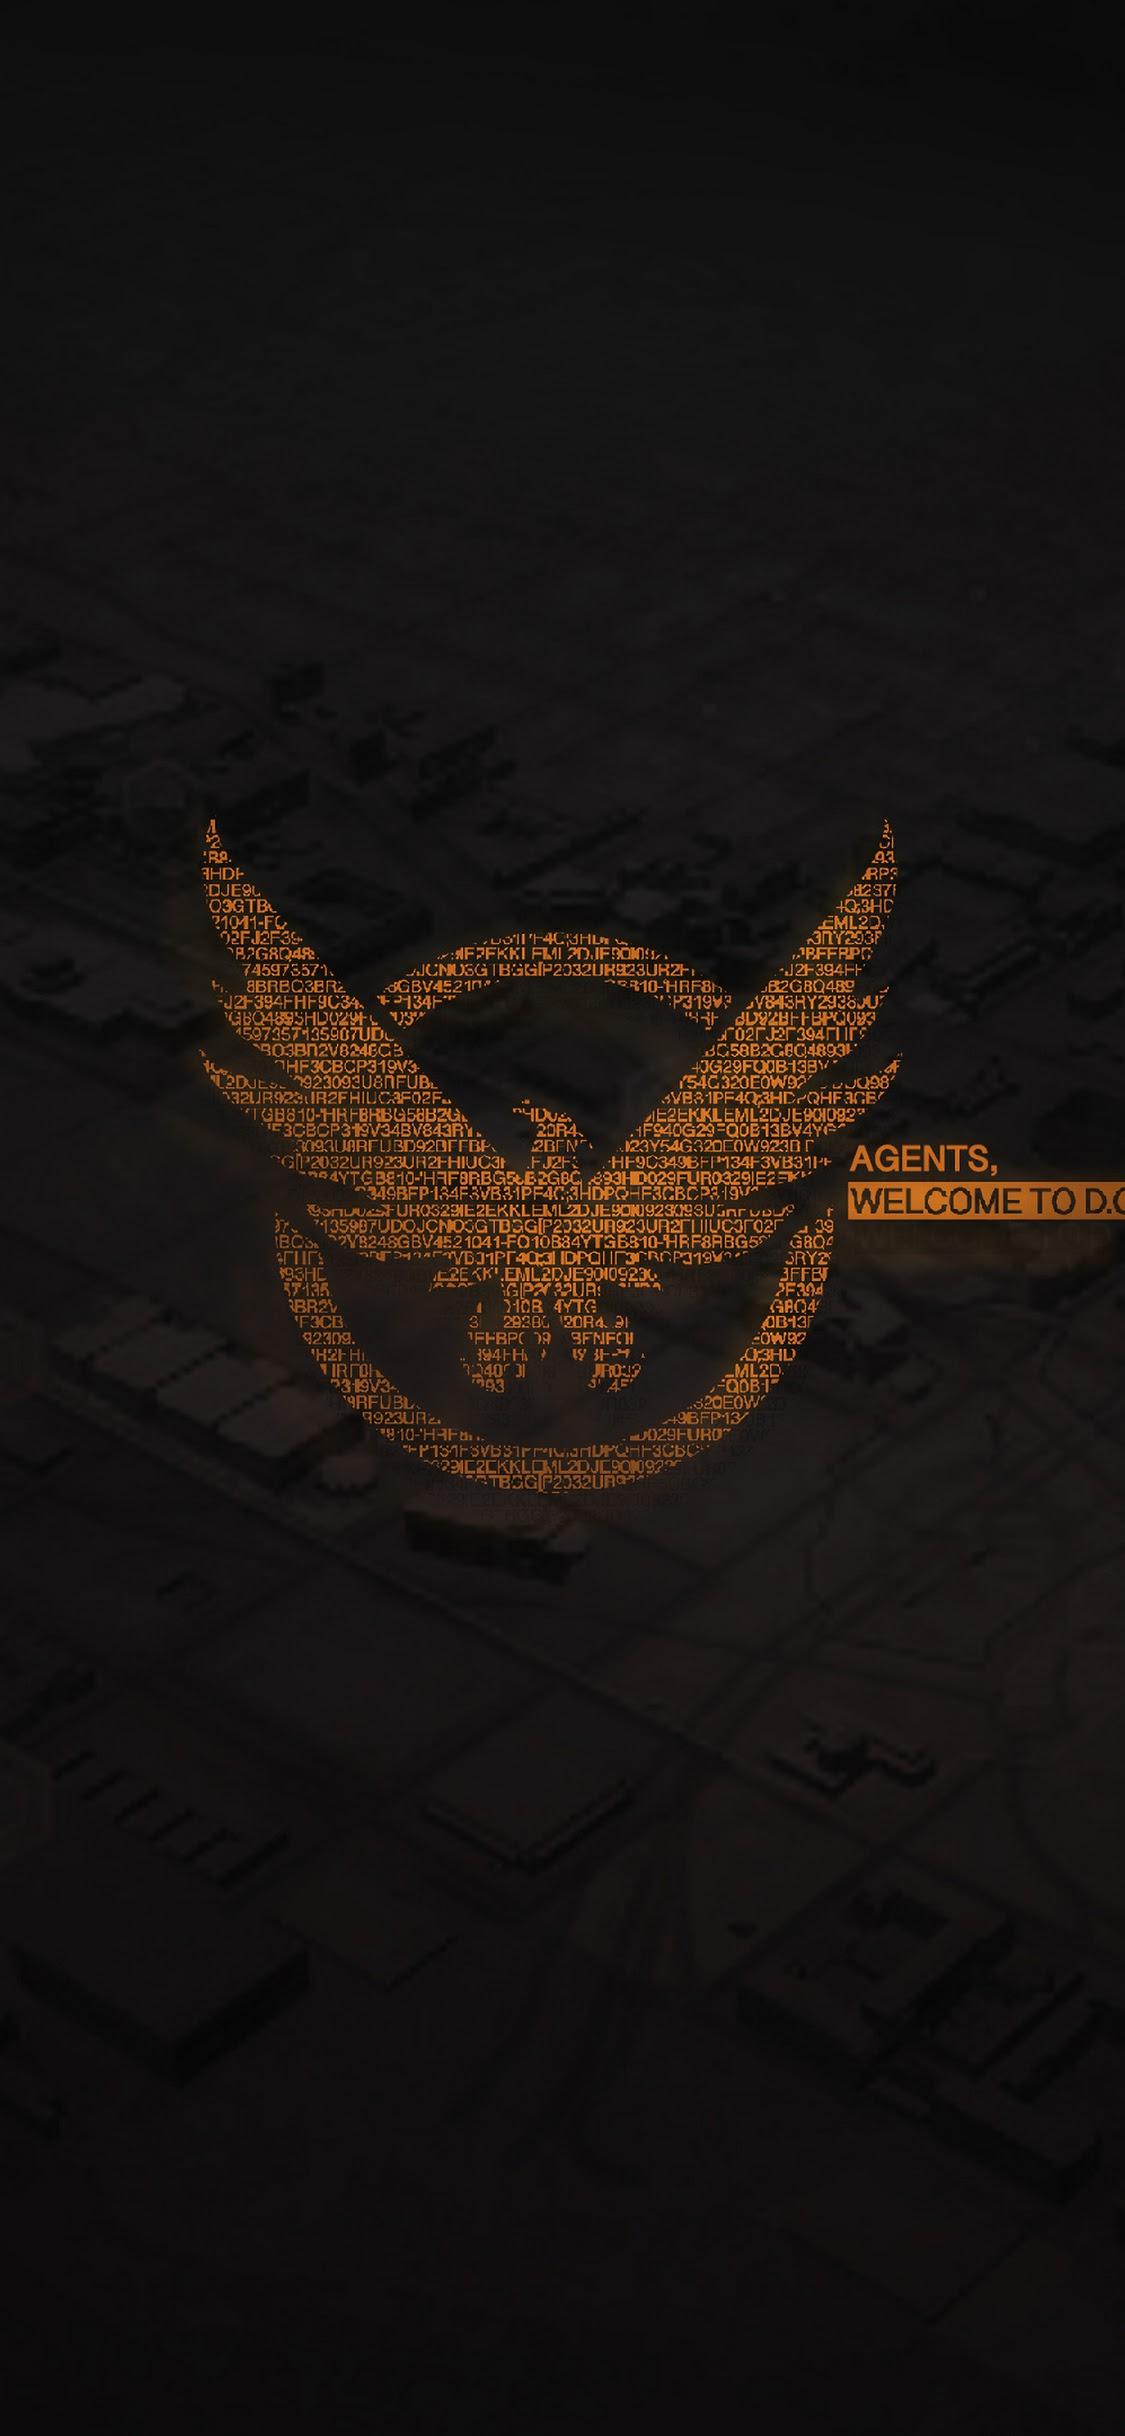 The Division 2 Shd Logo 4k Wallpaper 29